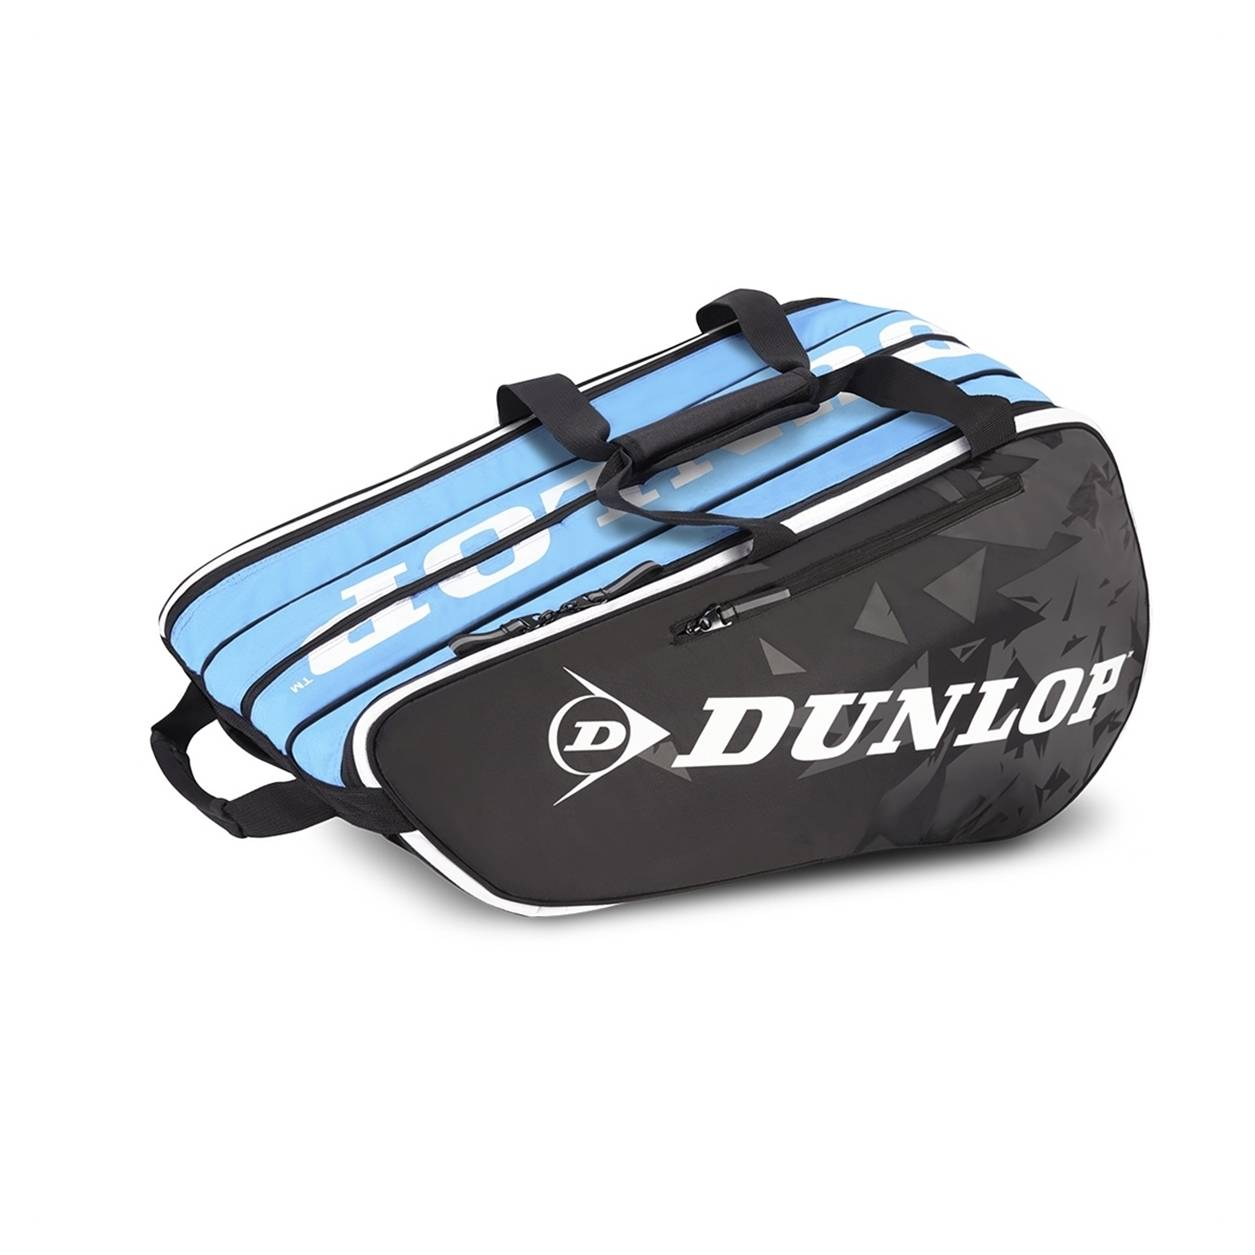 Dunlop Tour 6 Racket Bag 2.0 Black/Blue